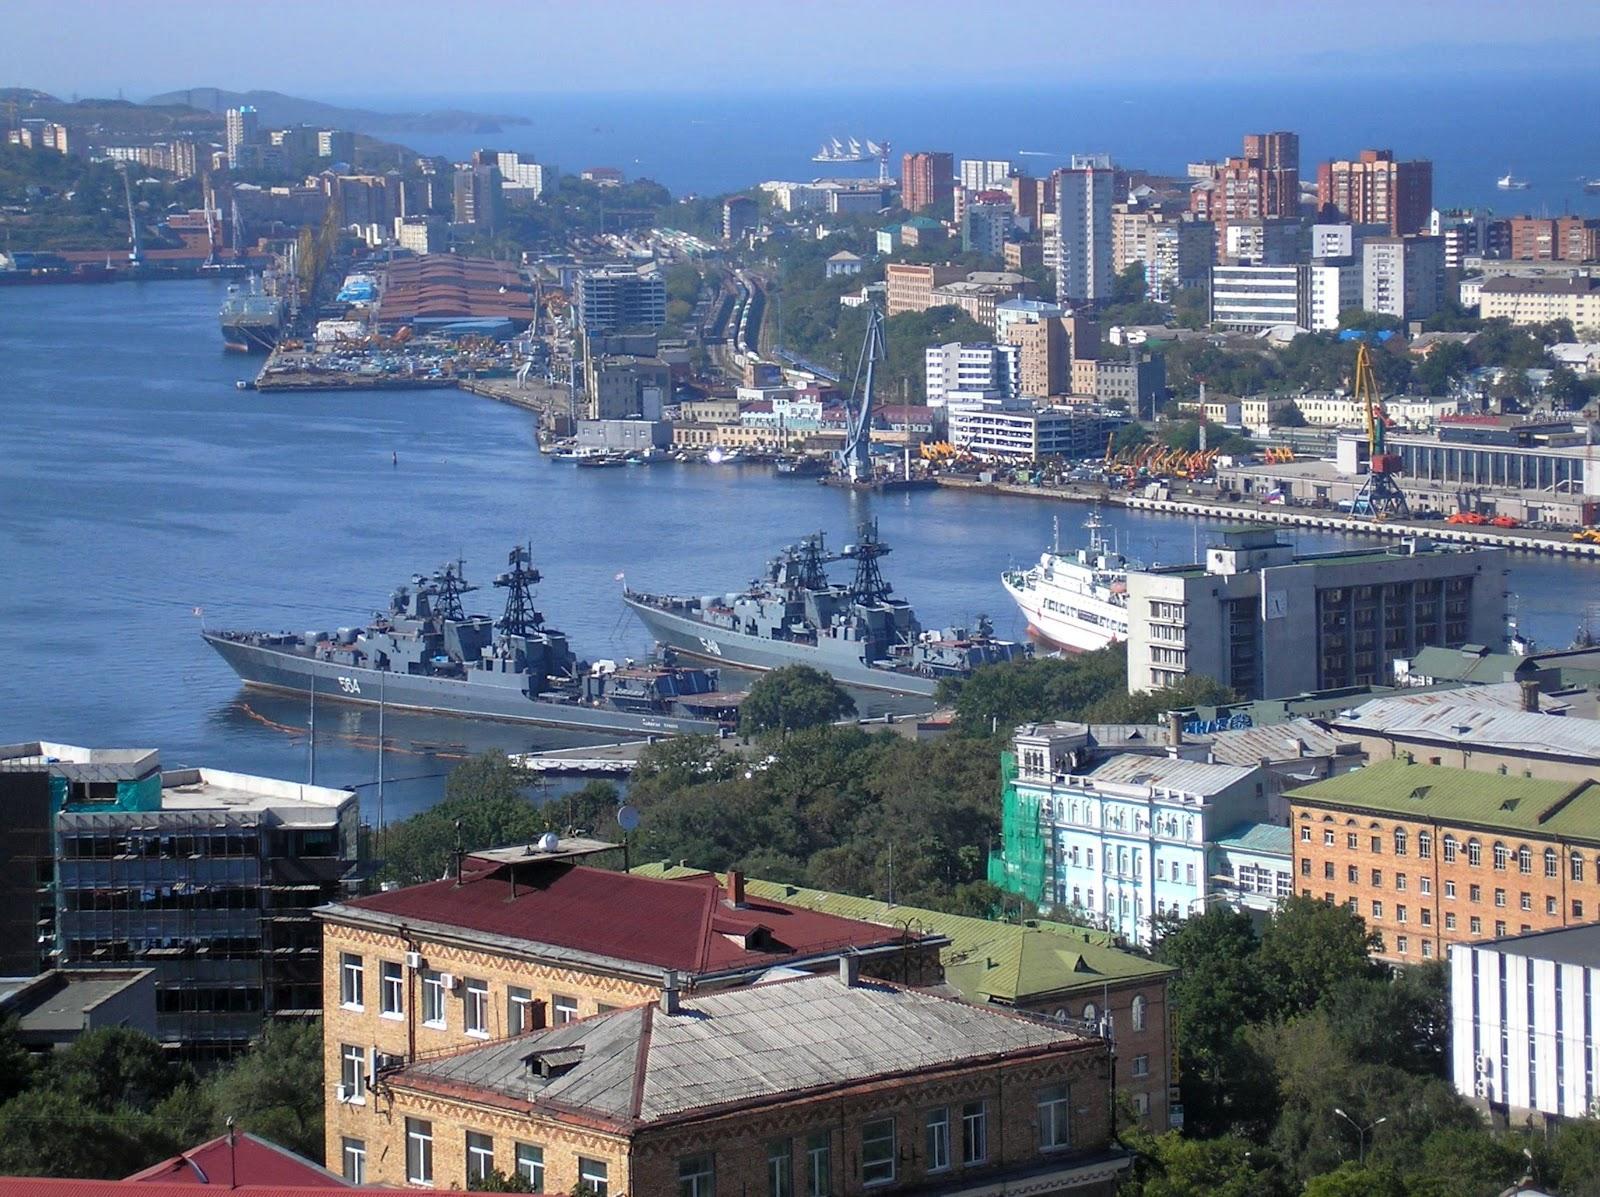 фото панорама улиц владивосток такое кпд